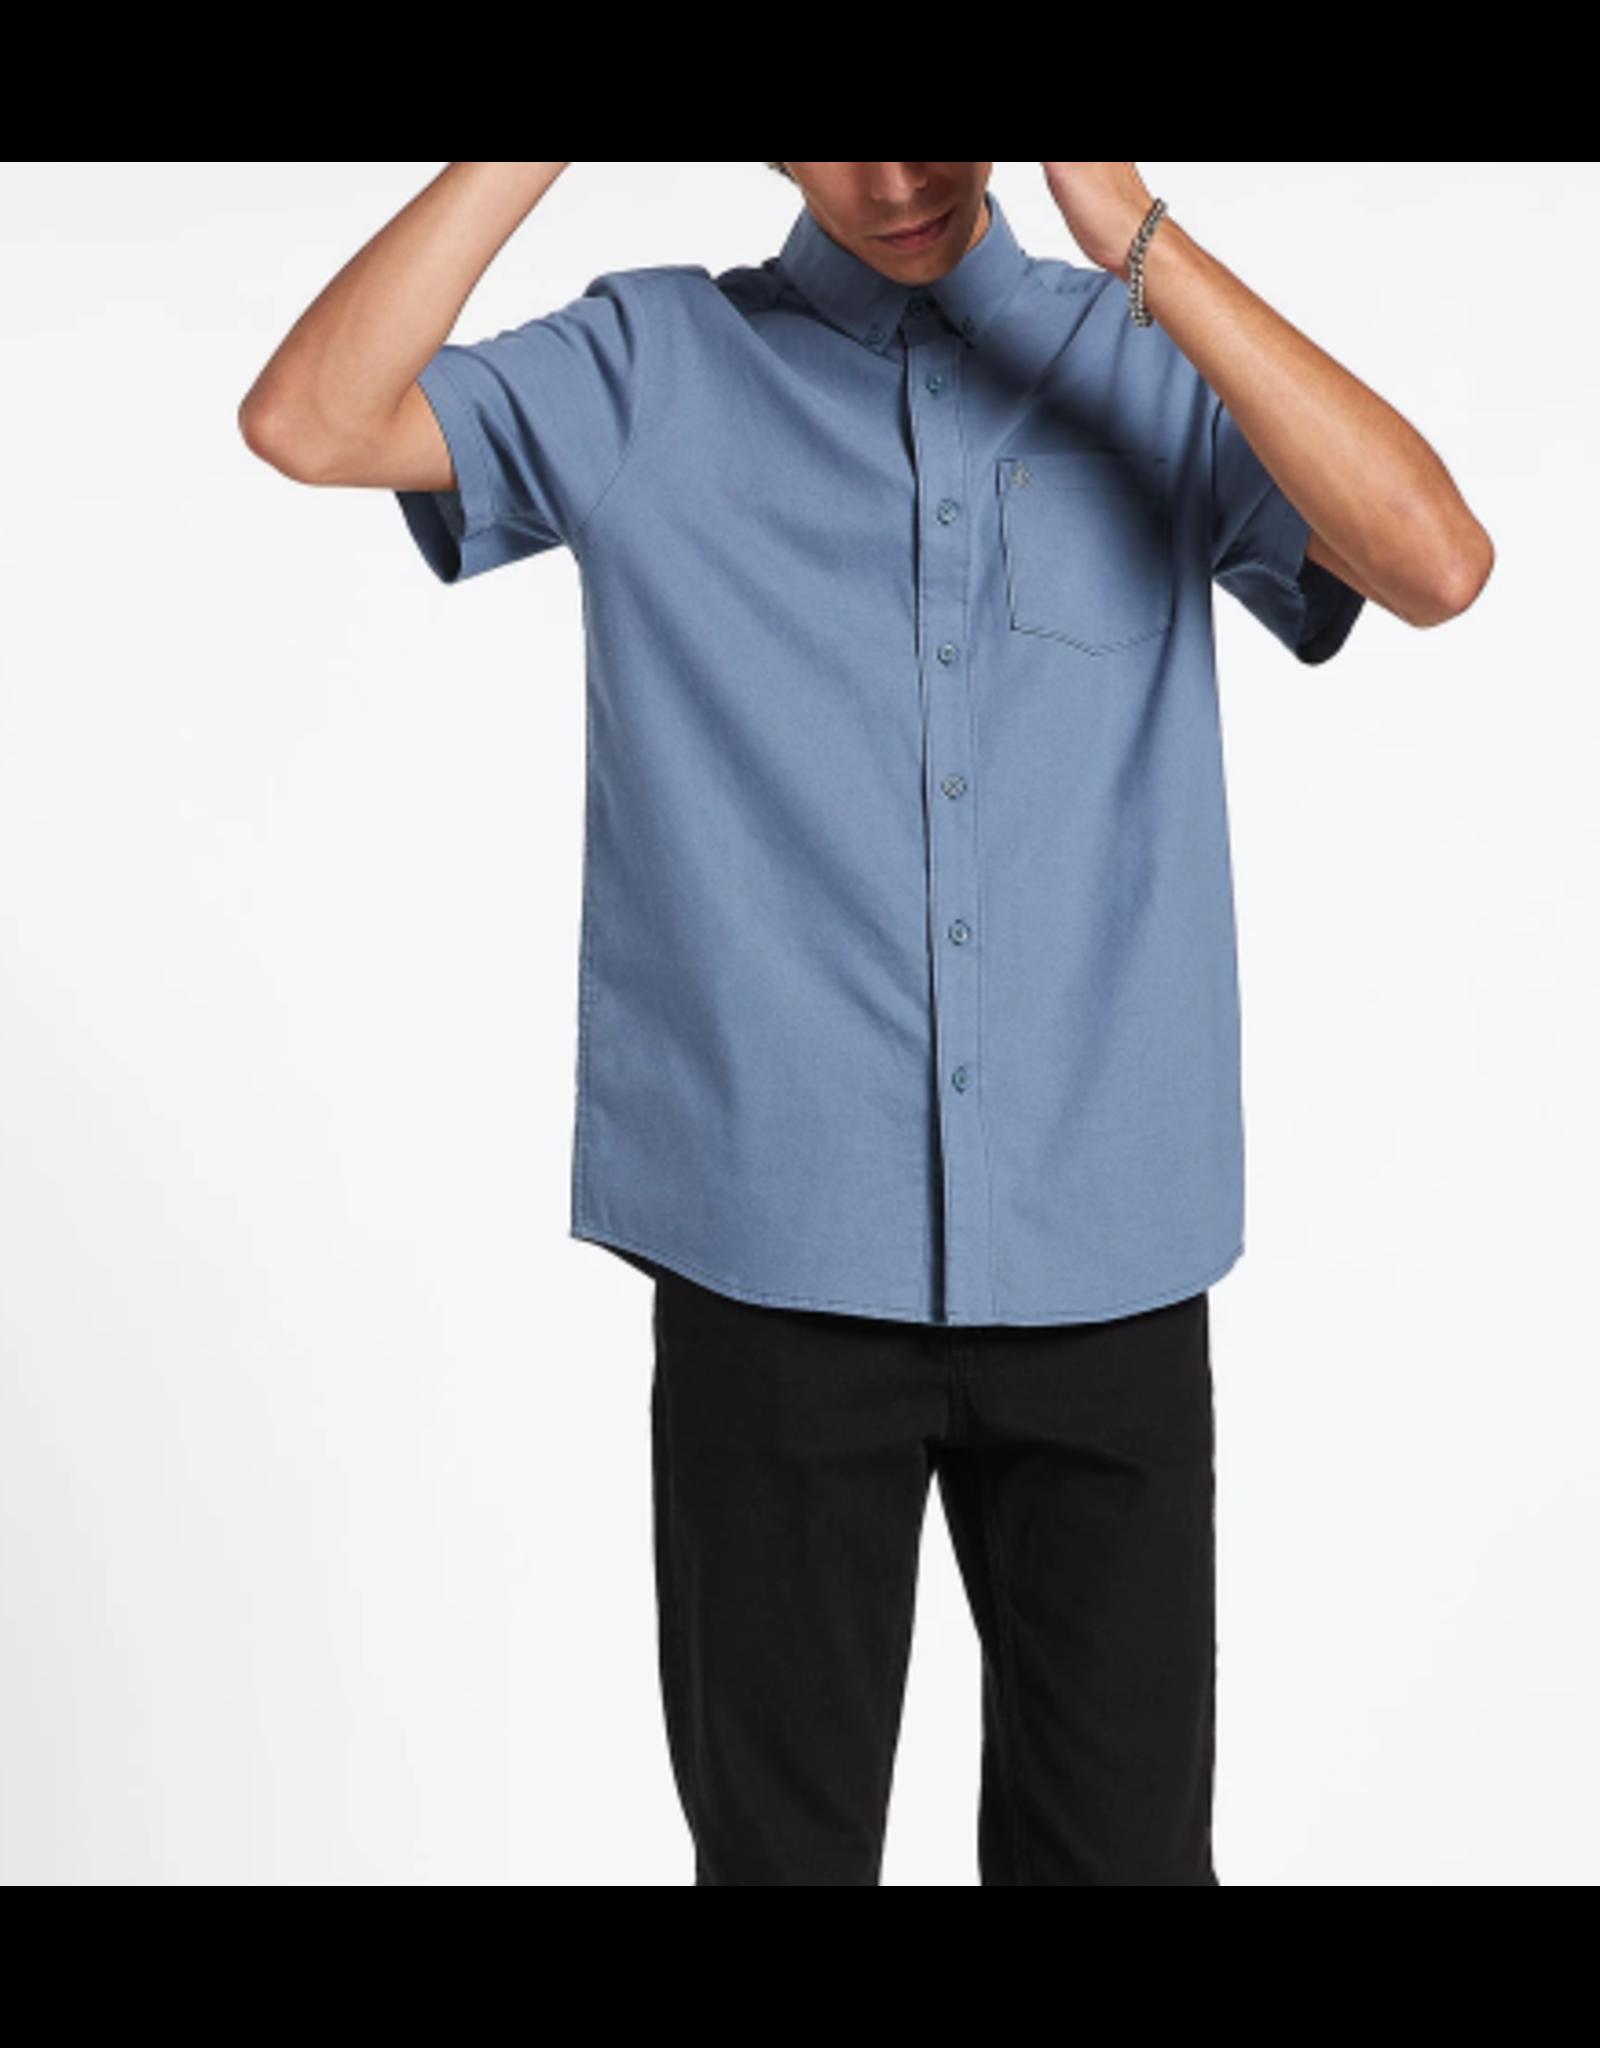 Volcom Everett Oxford Shirt - Stormy Blue